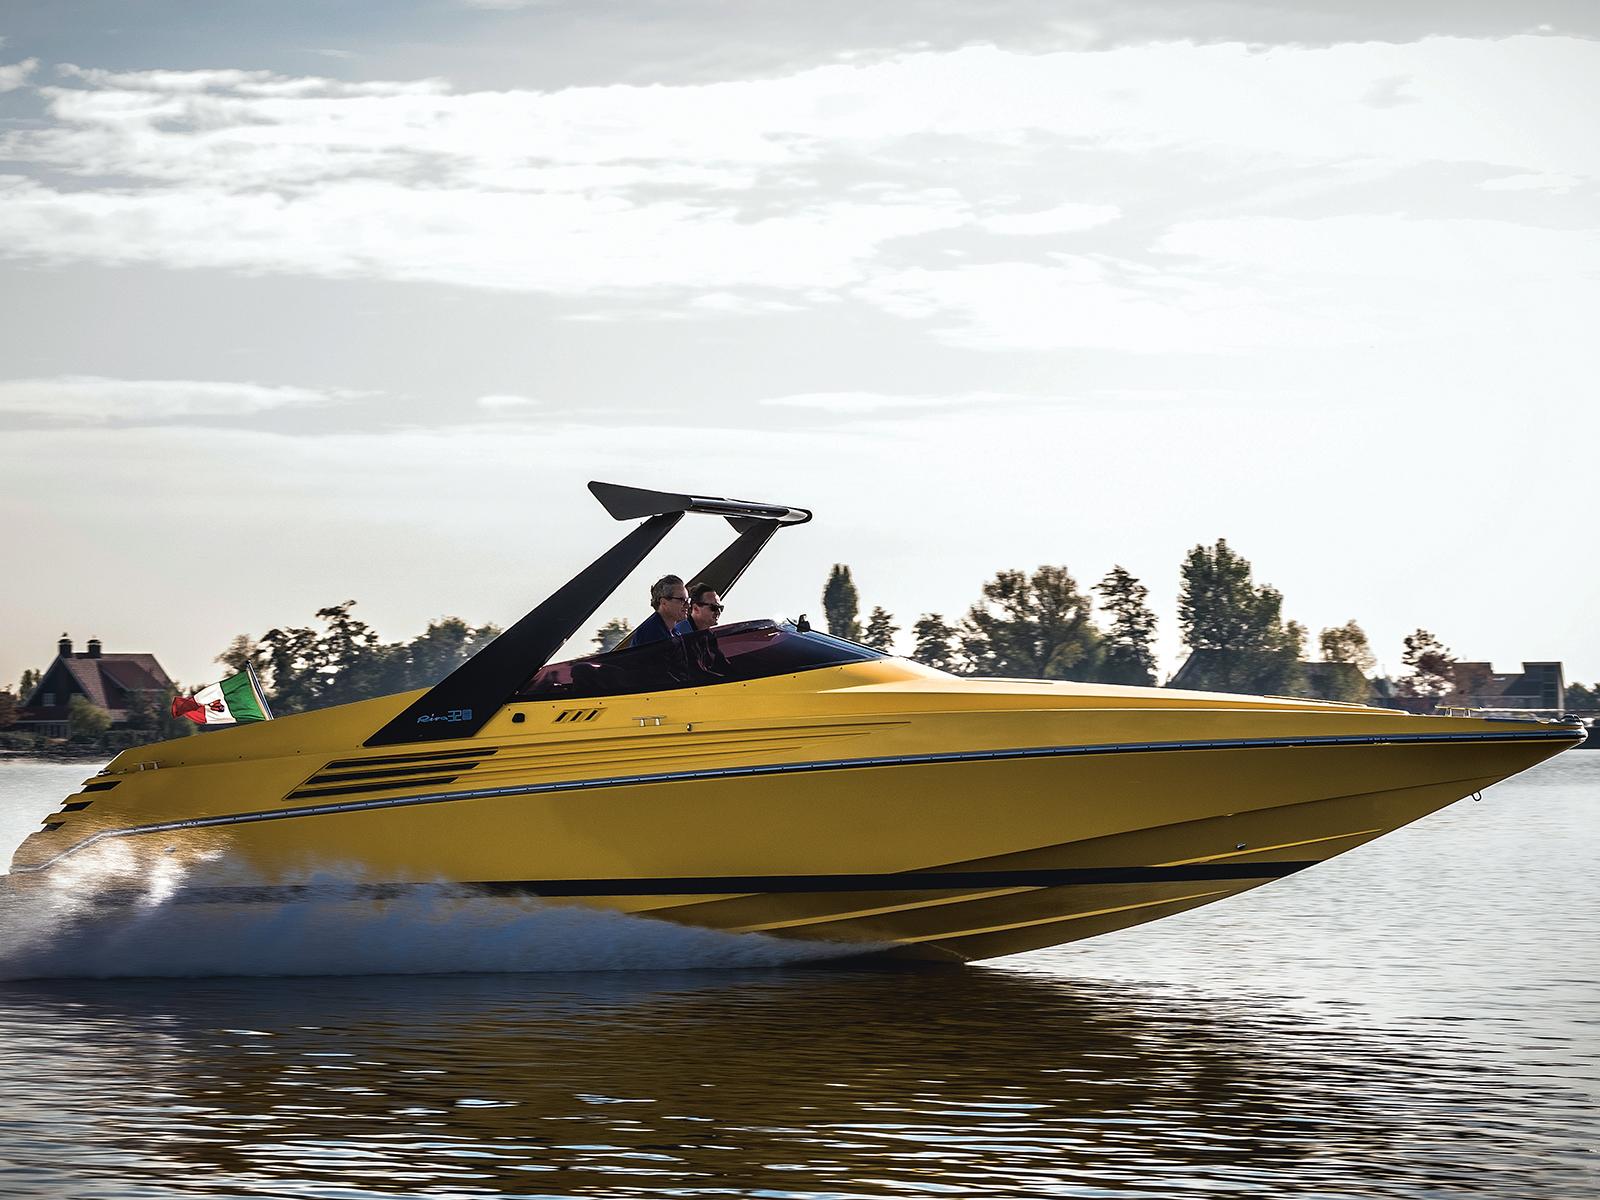 A yellow Riva Ferrari 32 on the water